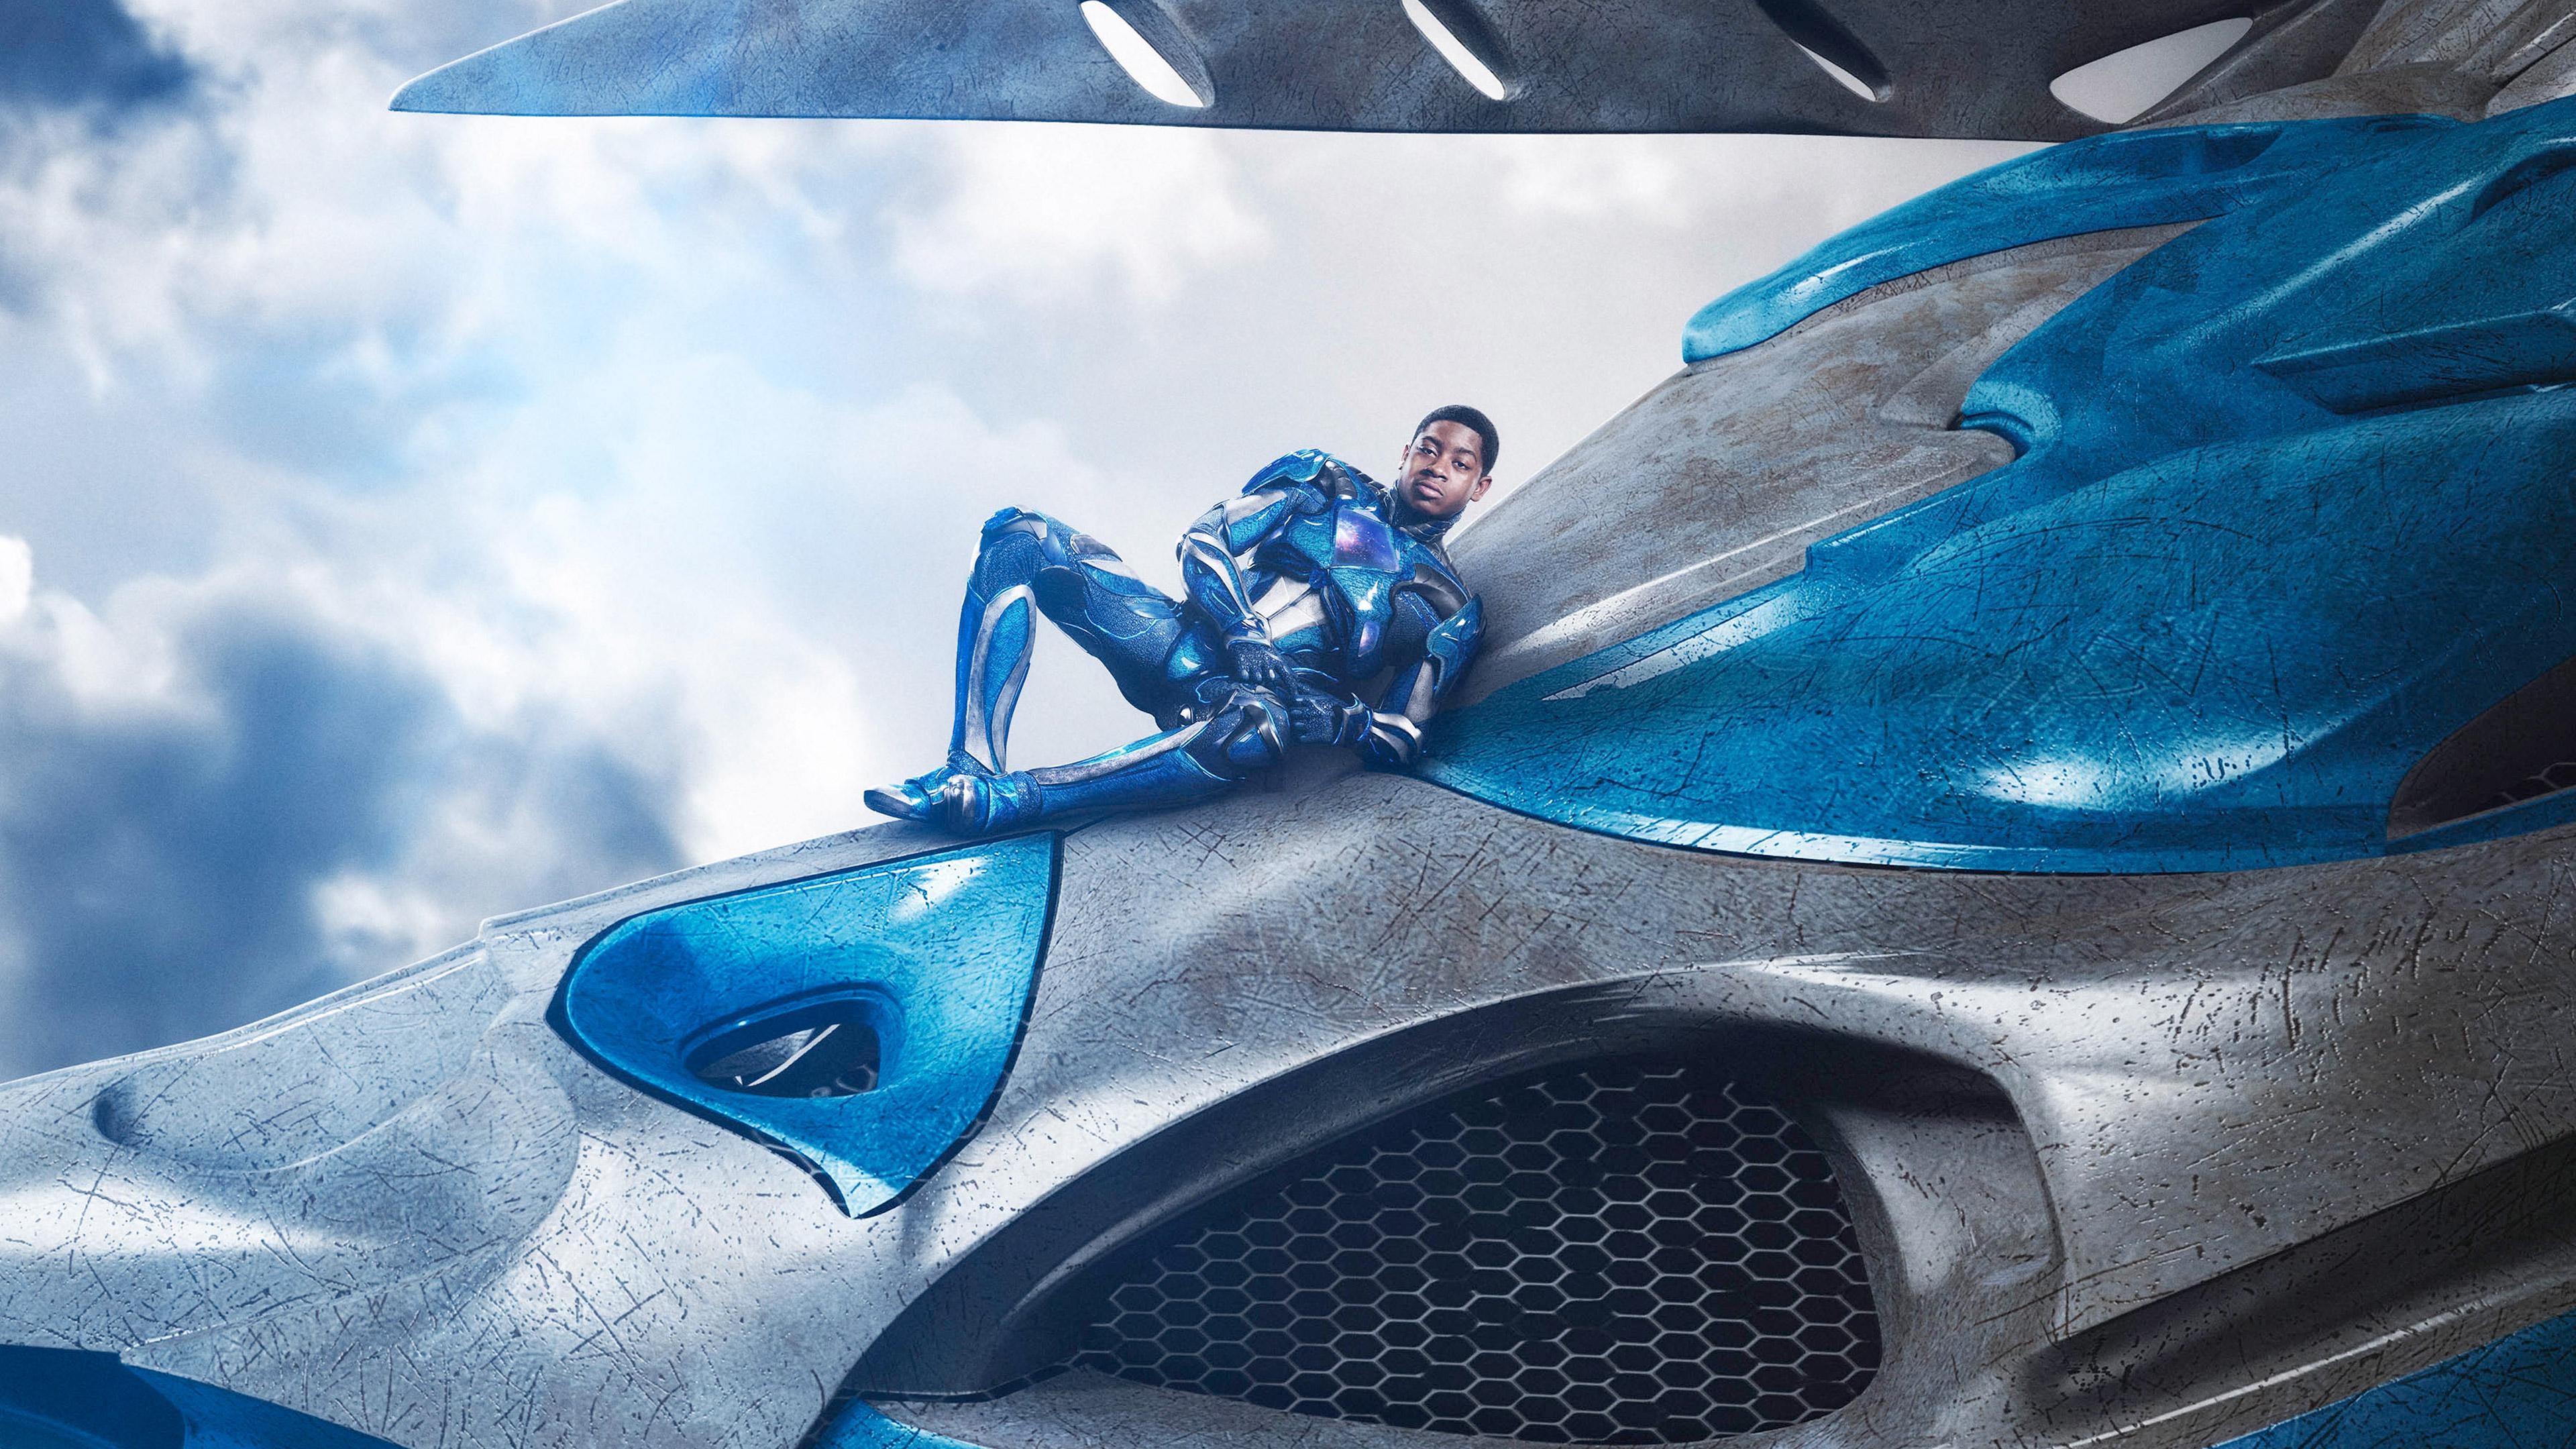 2017 power rangers movie zord blue 1536400195 - 2017 Power Rangers Movie Zord Blue - power rangers wallpapers, movies wallpapers, 2017 movies wallpapers